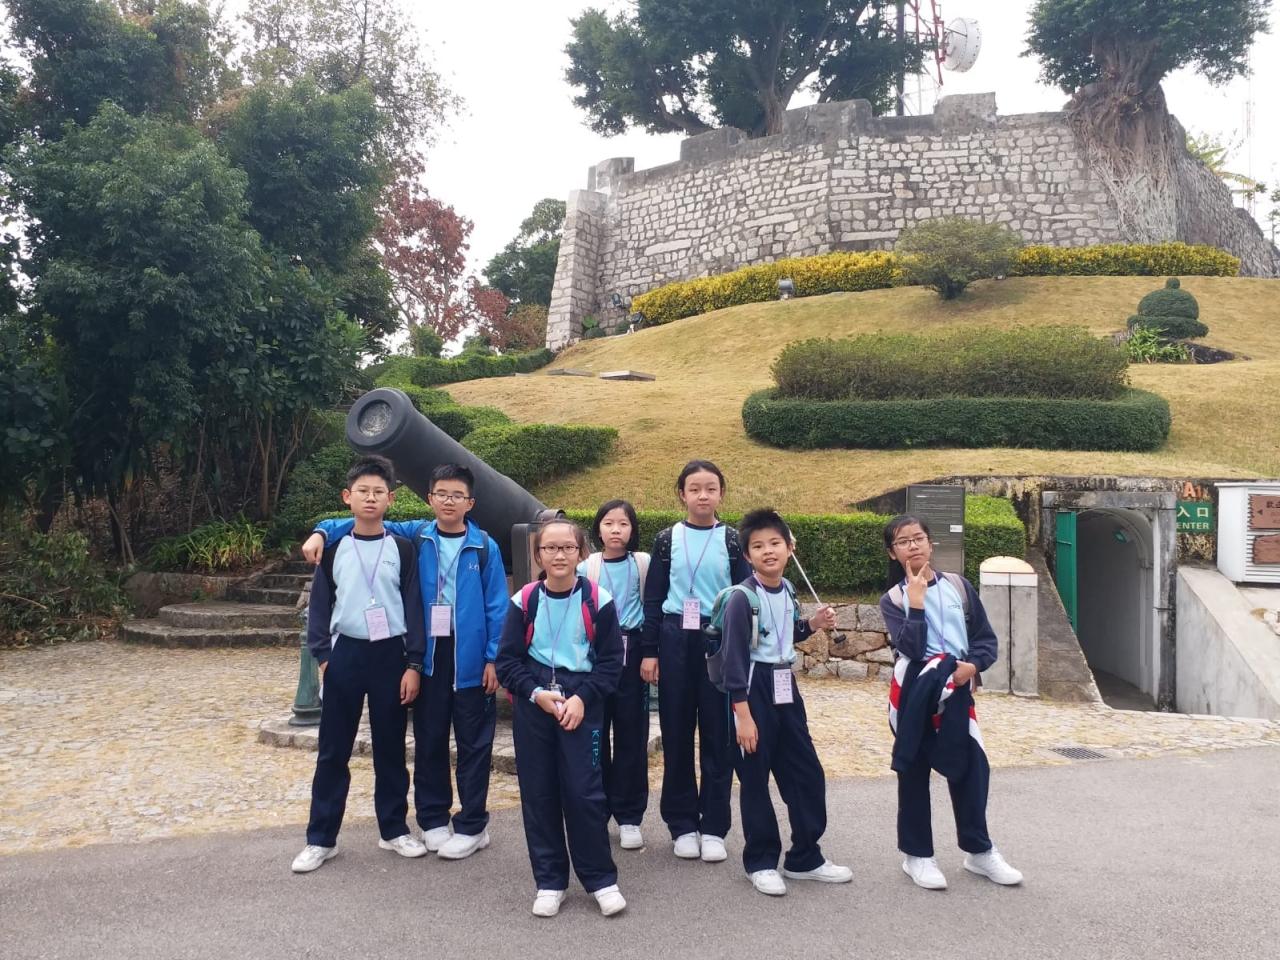 http://keito.school.hk/sites/default/files/batch_jcln4033.jpg